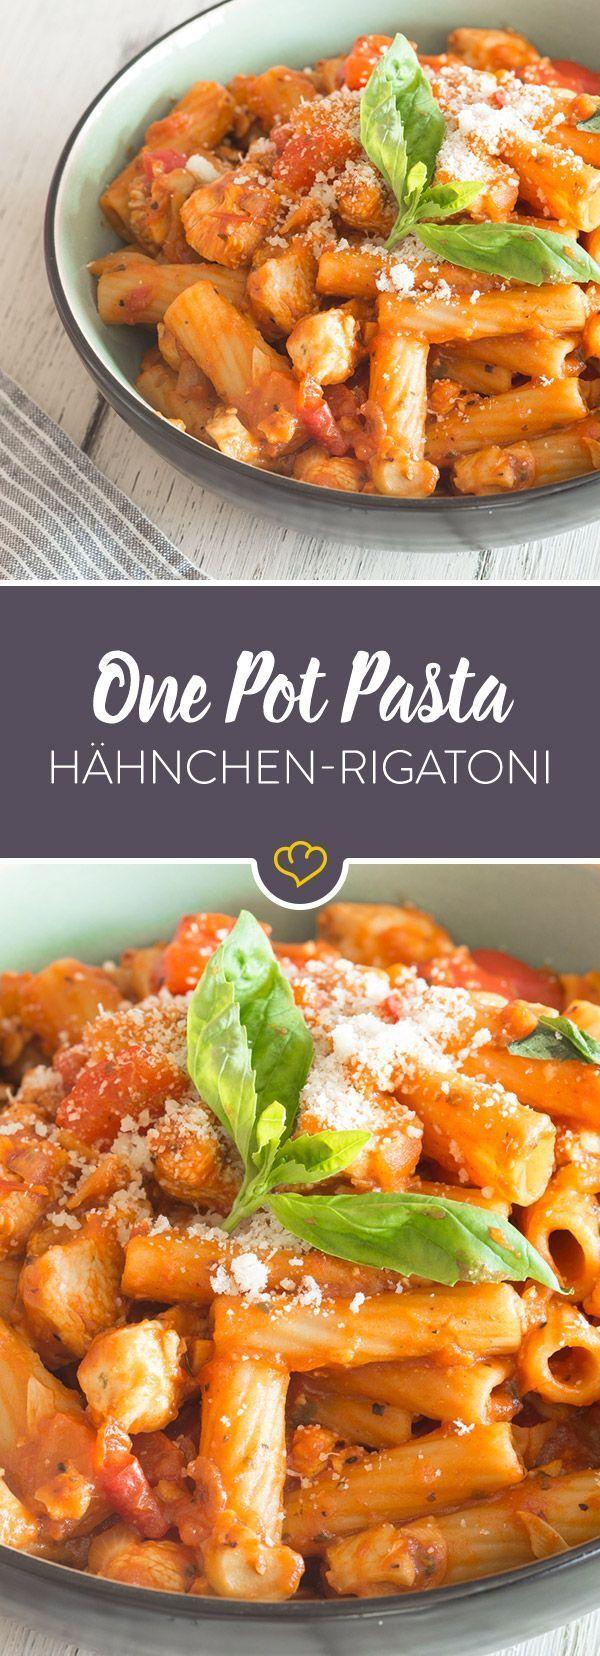 Photo of One Pot Pasta: Spicy Chicken Rigatoni